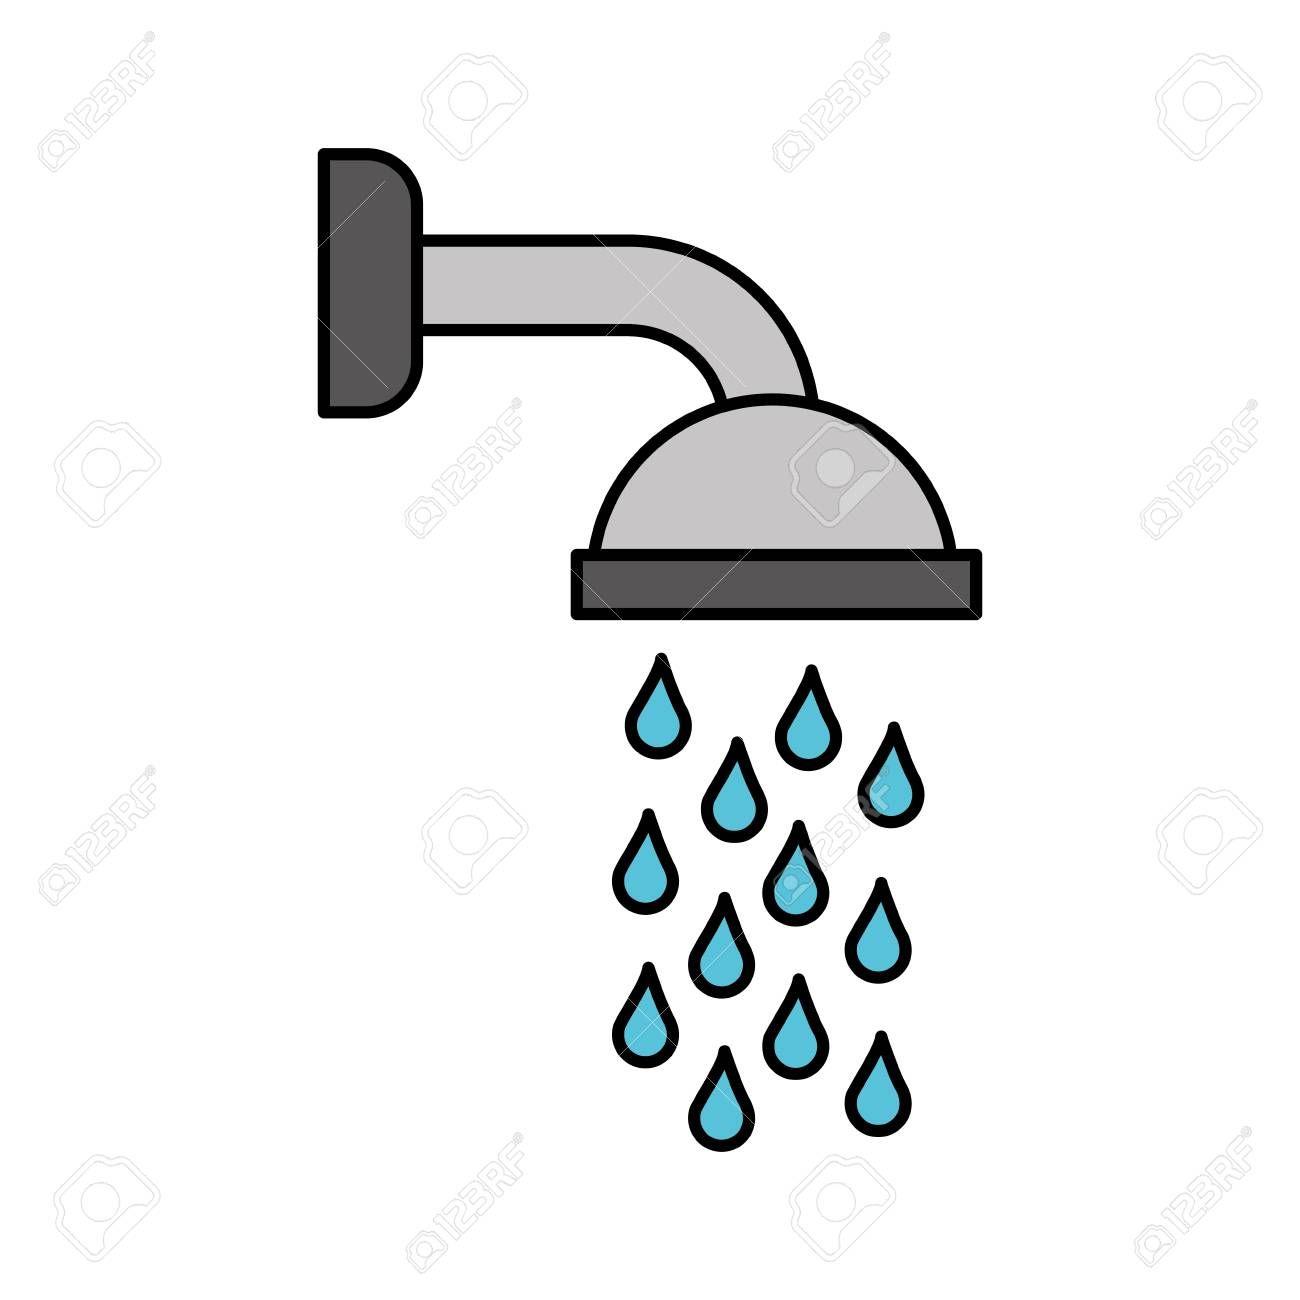 Shower Head In Bathroom With Water Drops Flowing Vector